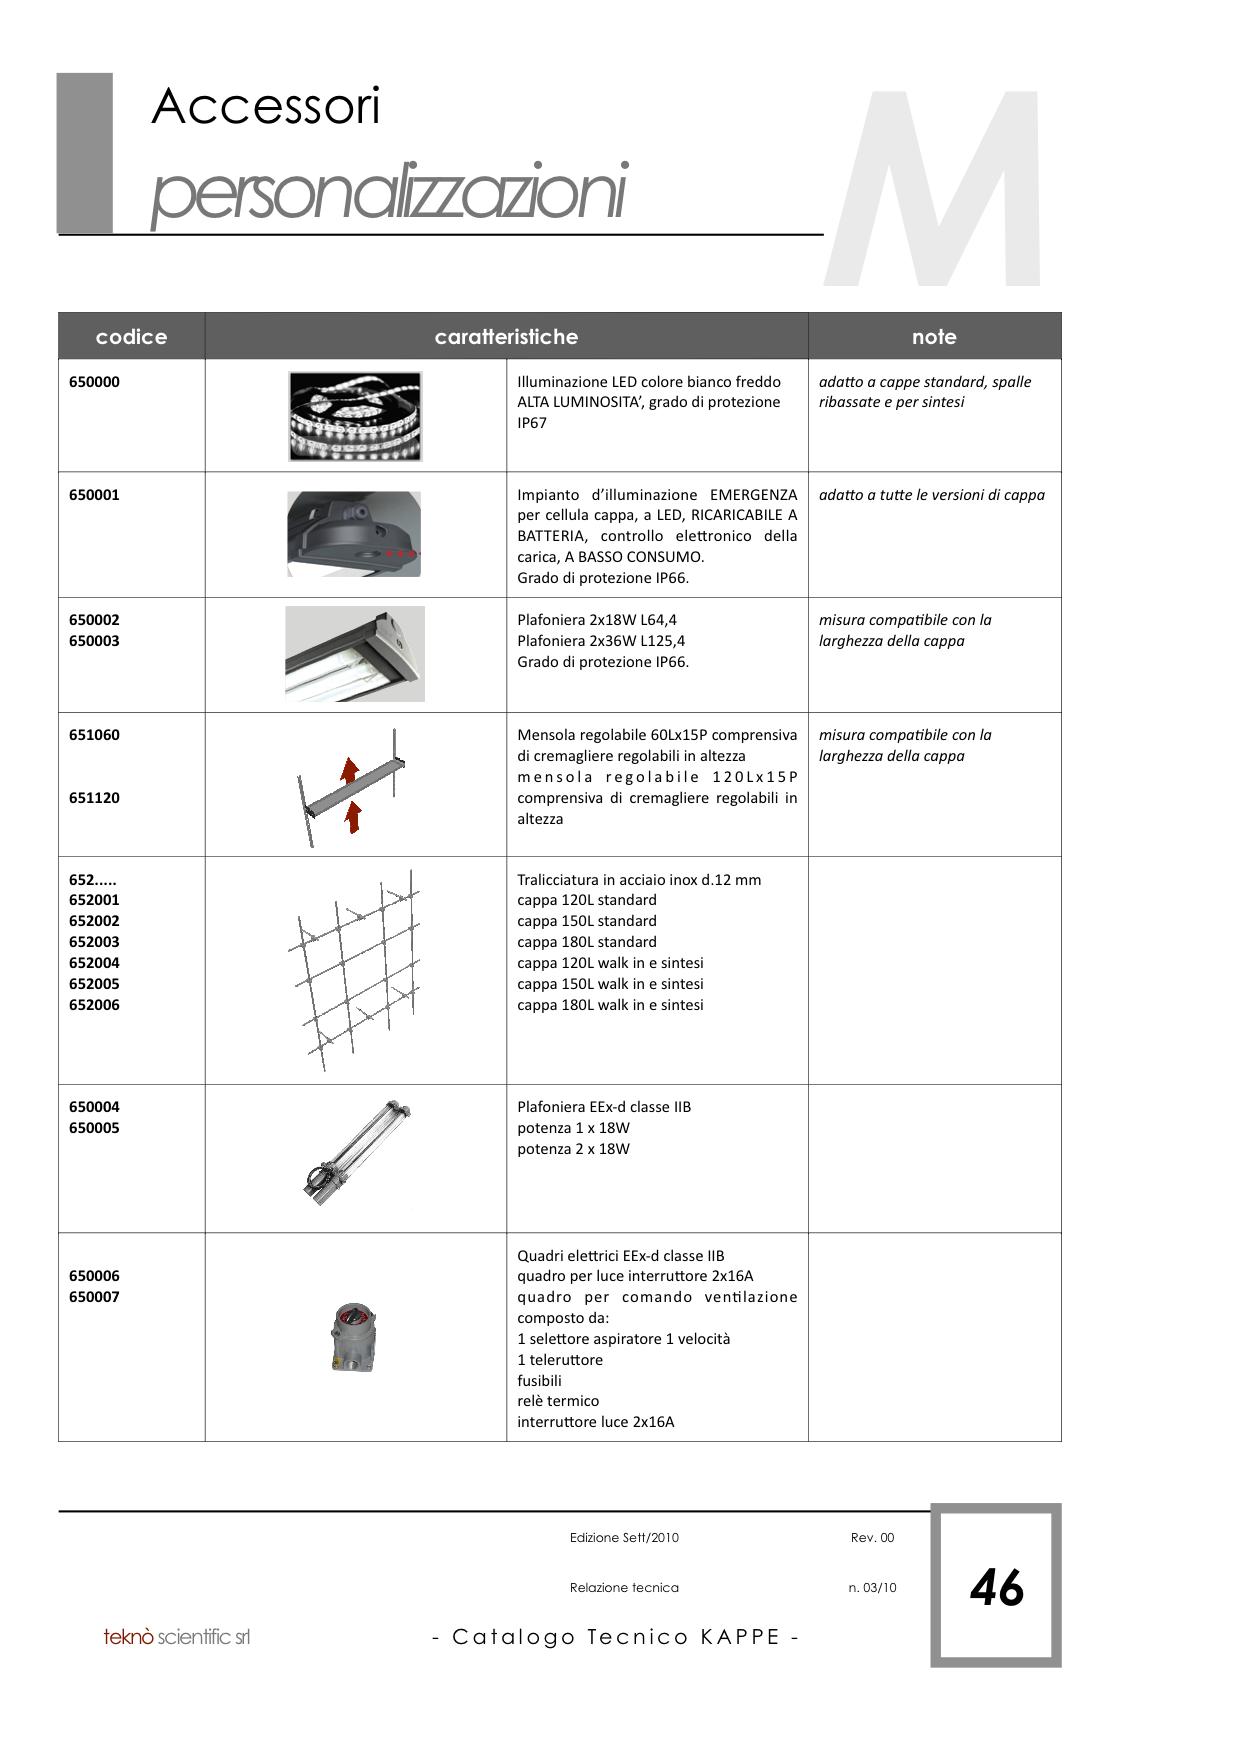 KAPPE Catalogo Tecnico Generale copia 16.png